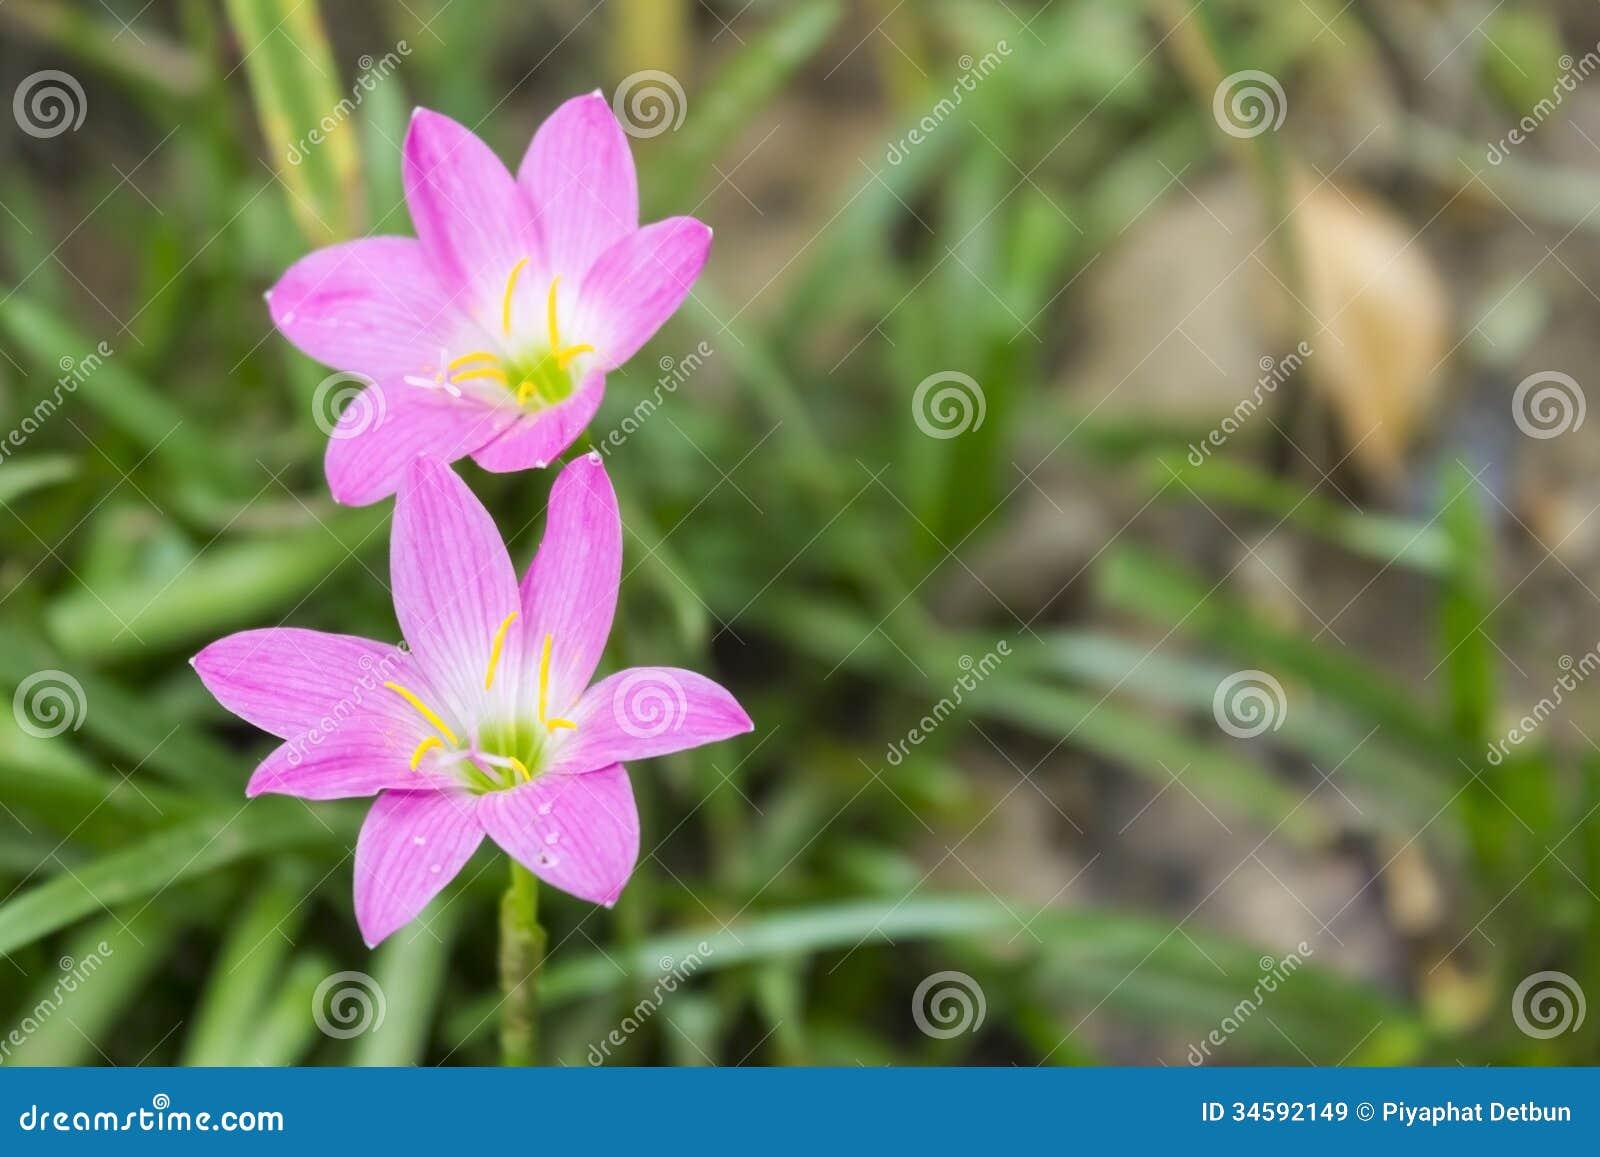 Famosos Flores de Zephyranthes imagem de stock. Imagem de fairy - 34592149 FV42